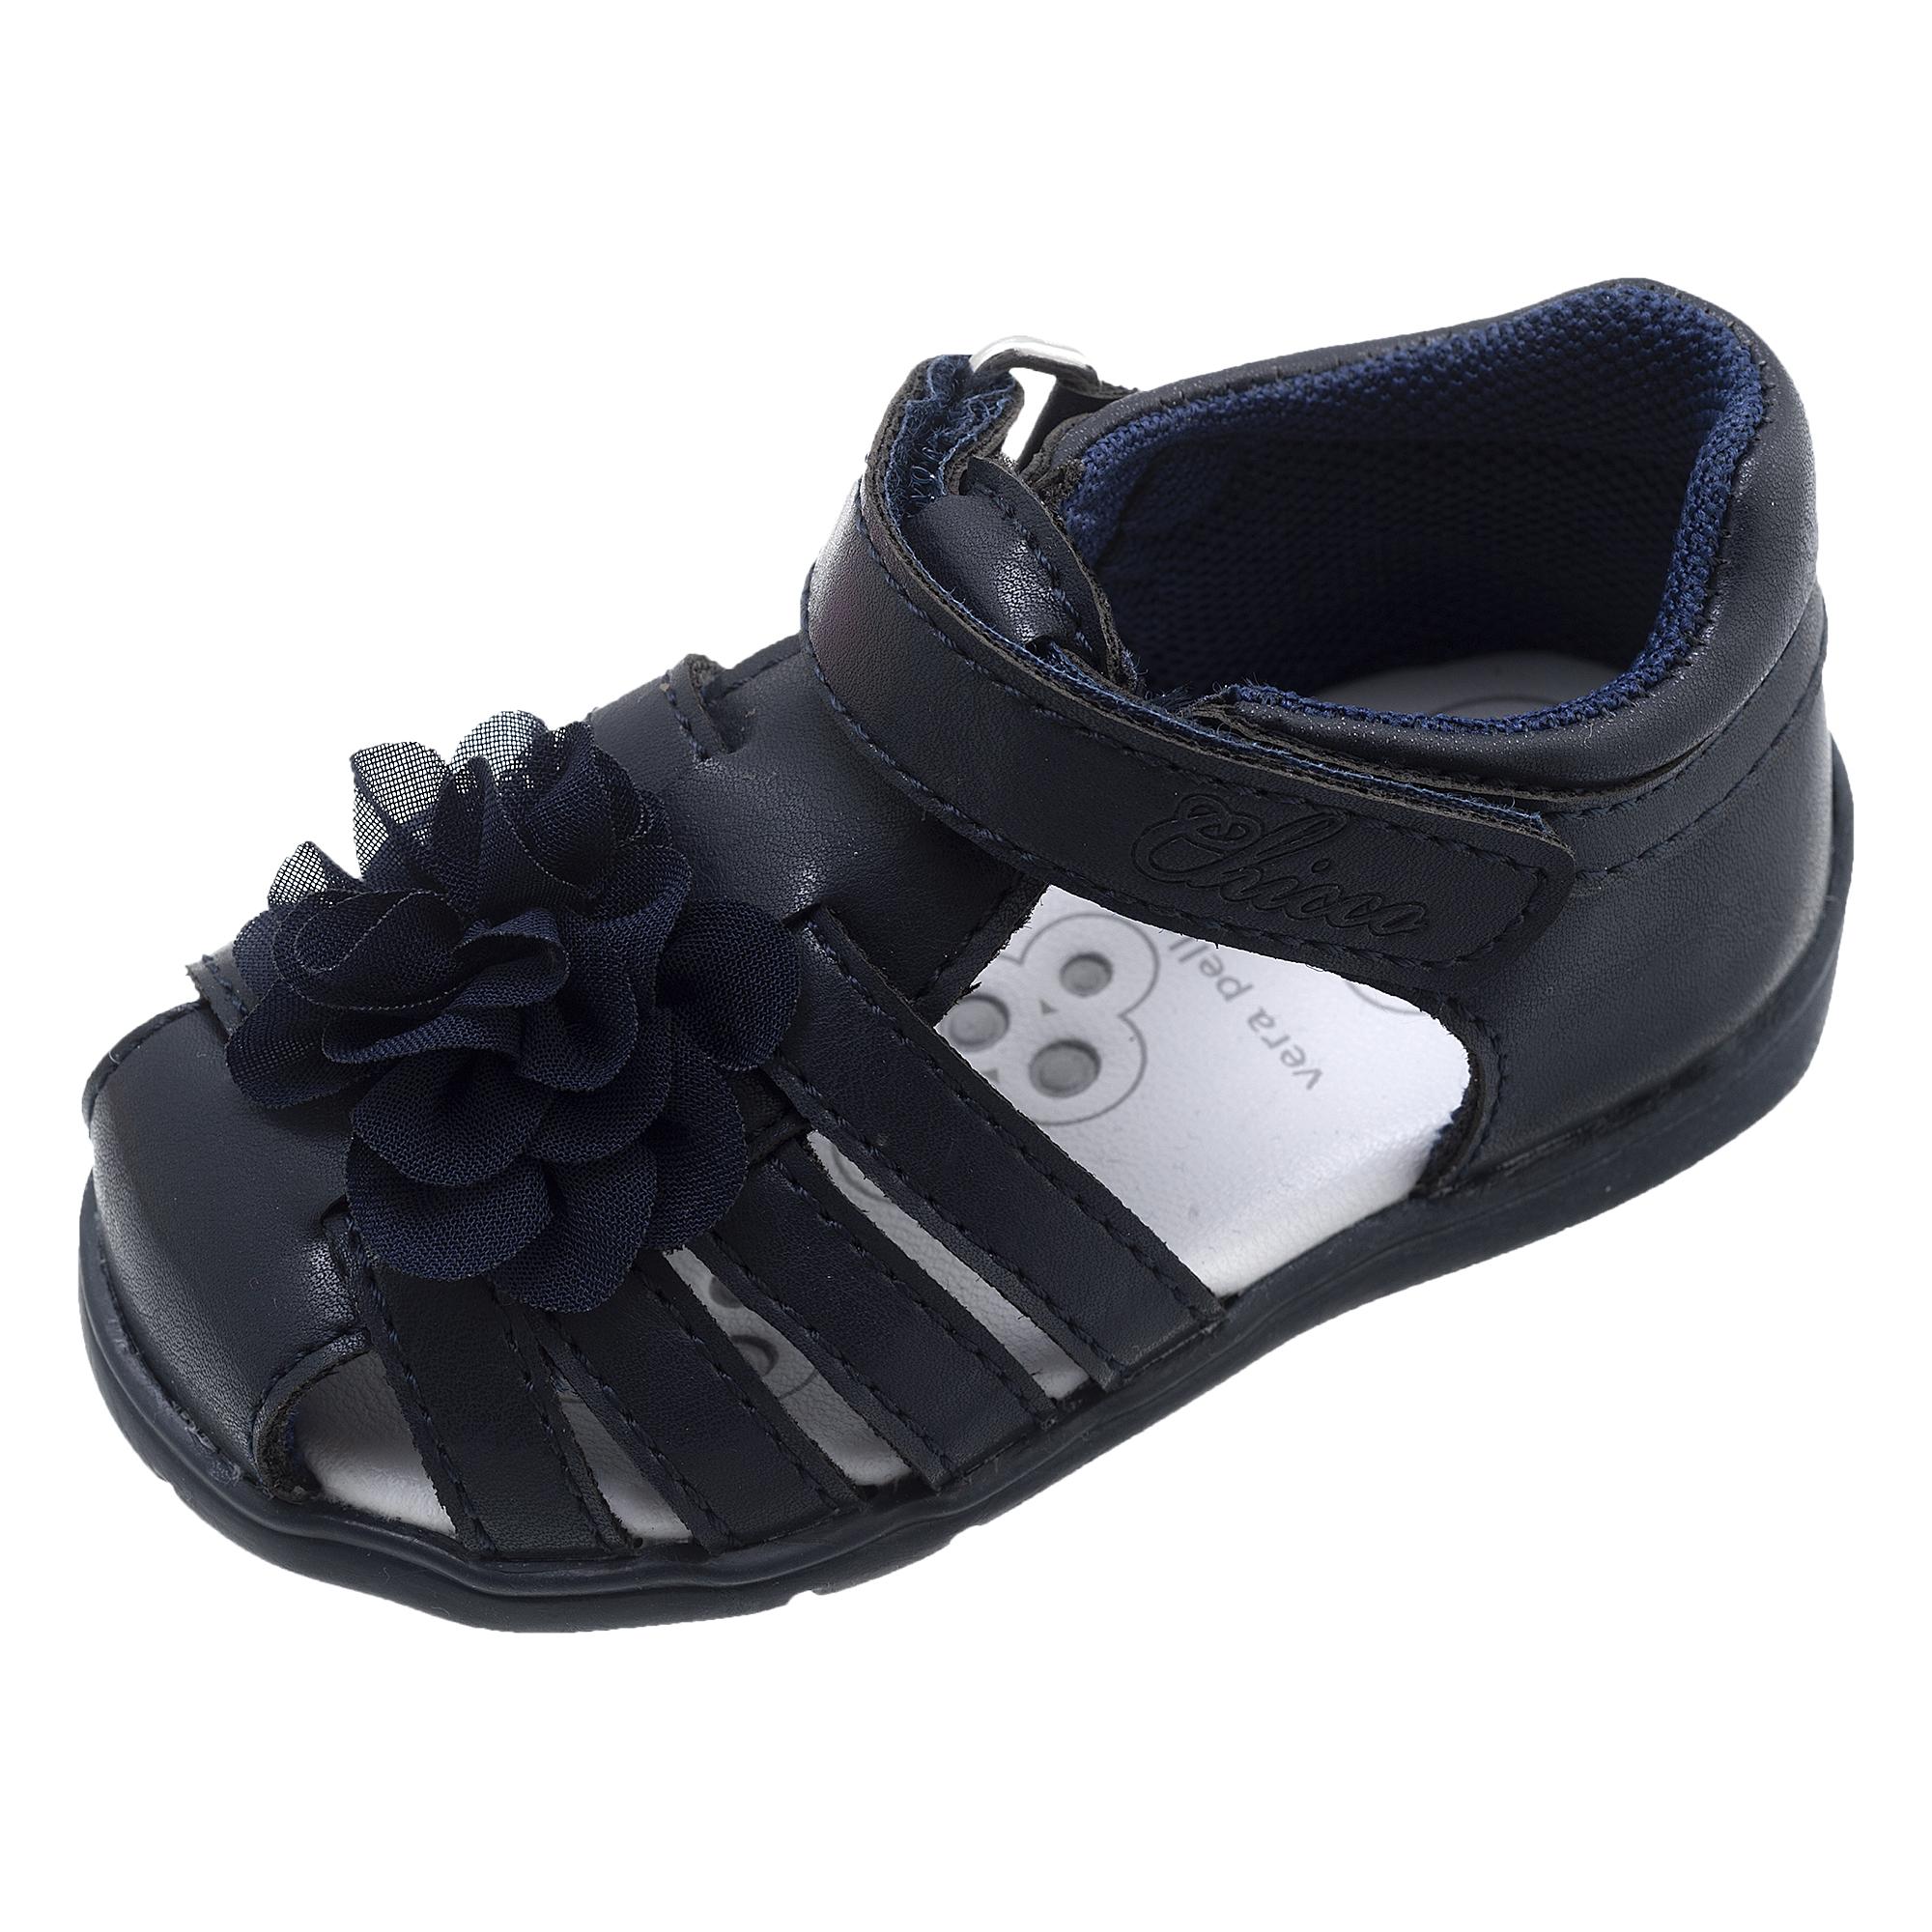 Sandale Copii Chicco Gallery, Bleu Deschis, 63519 imagine